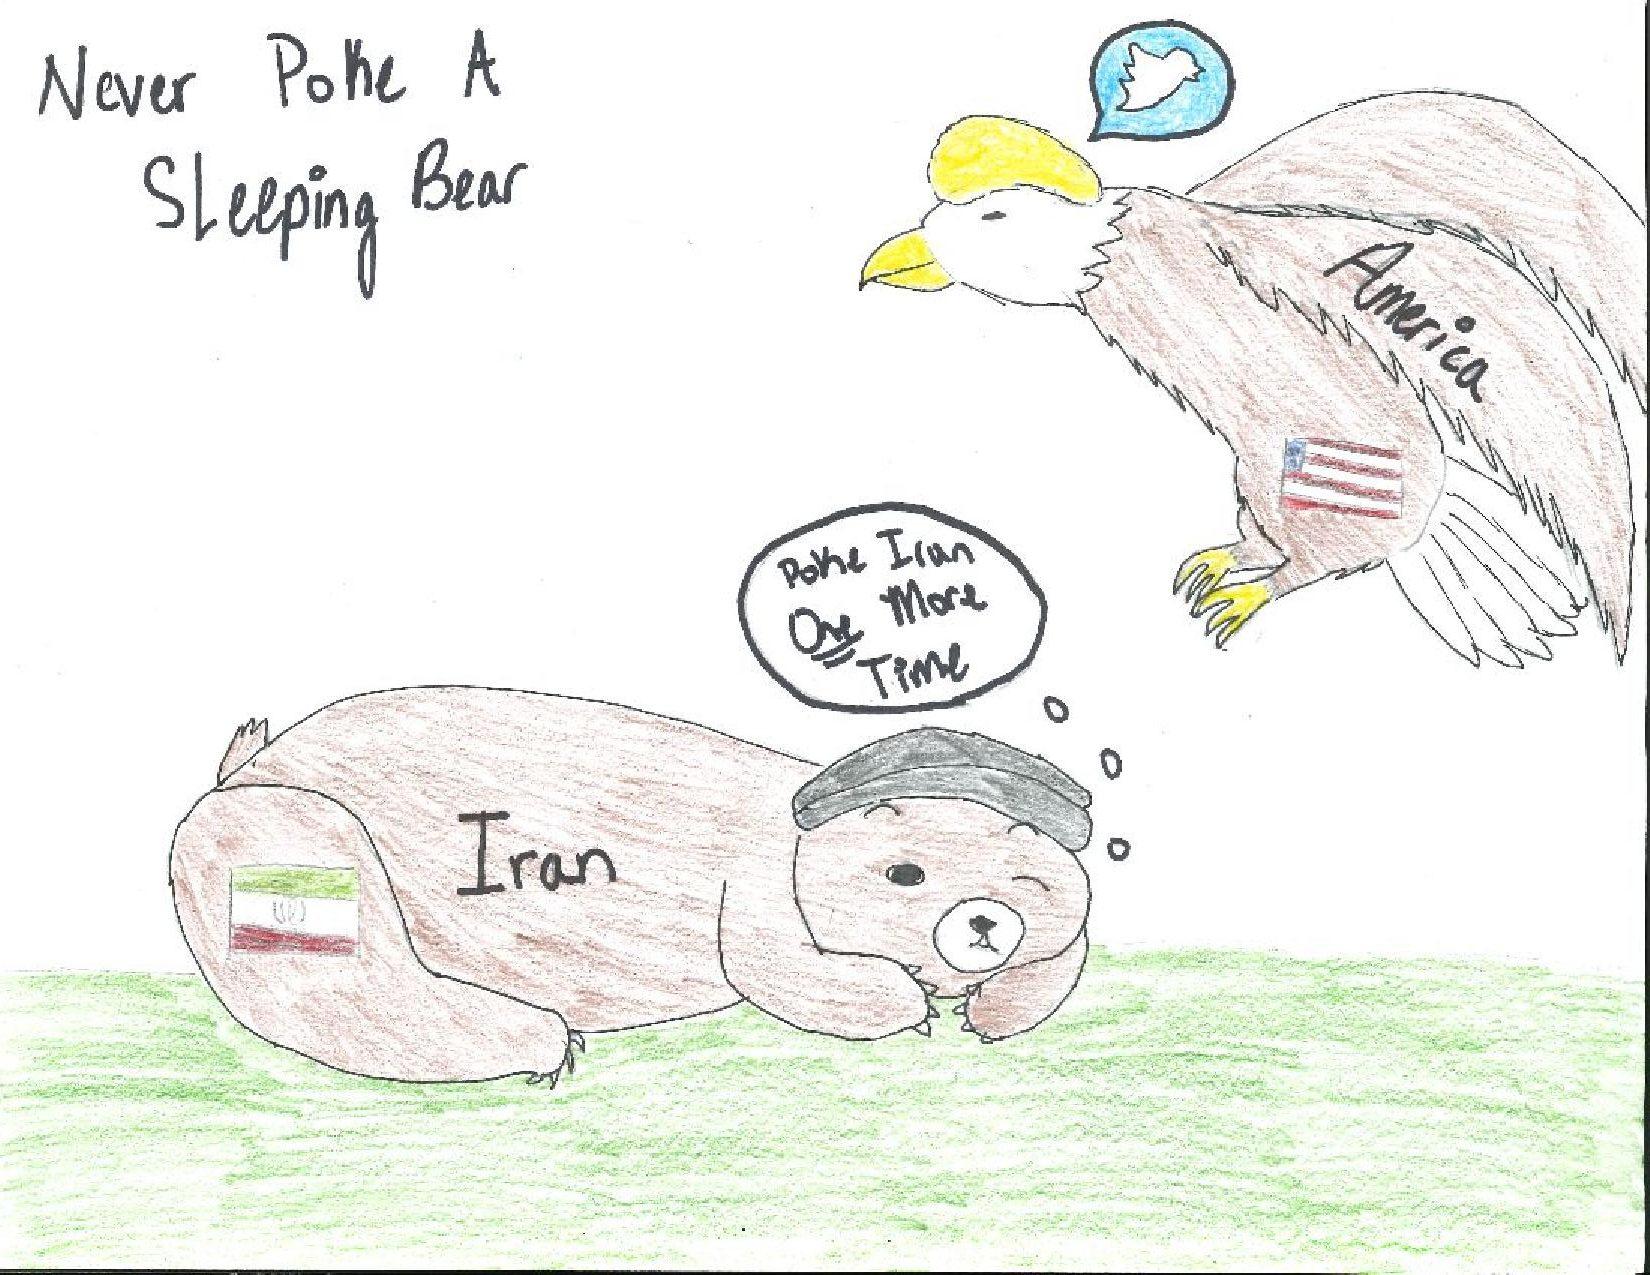 Editorial Cartoon: Tension between America and Iran increases